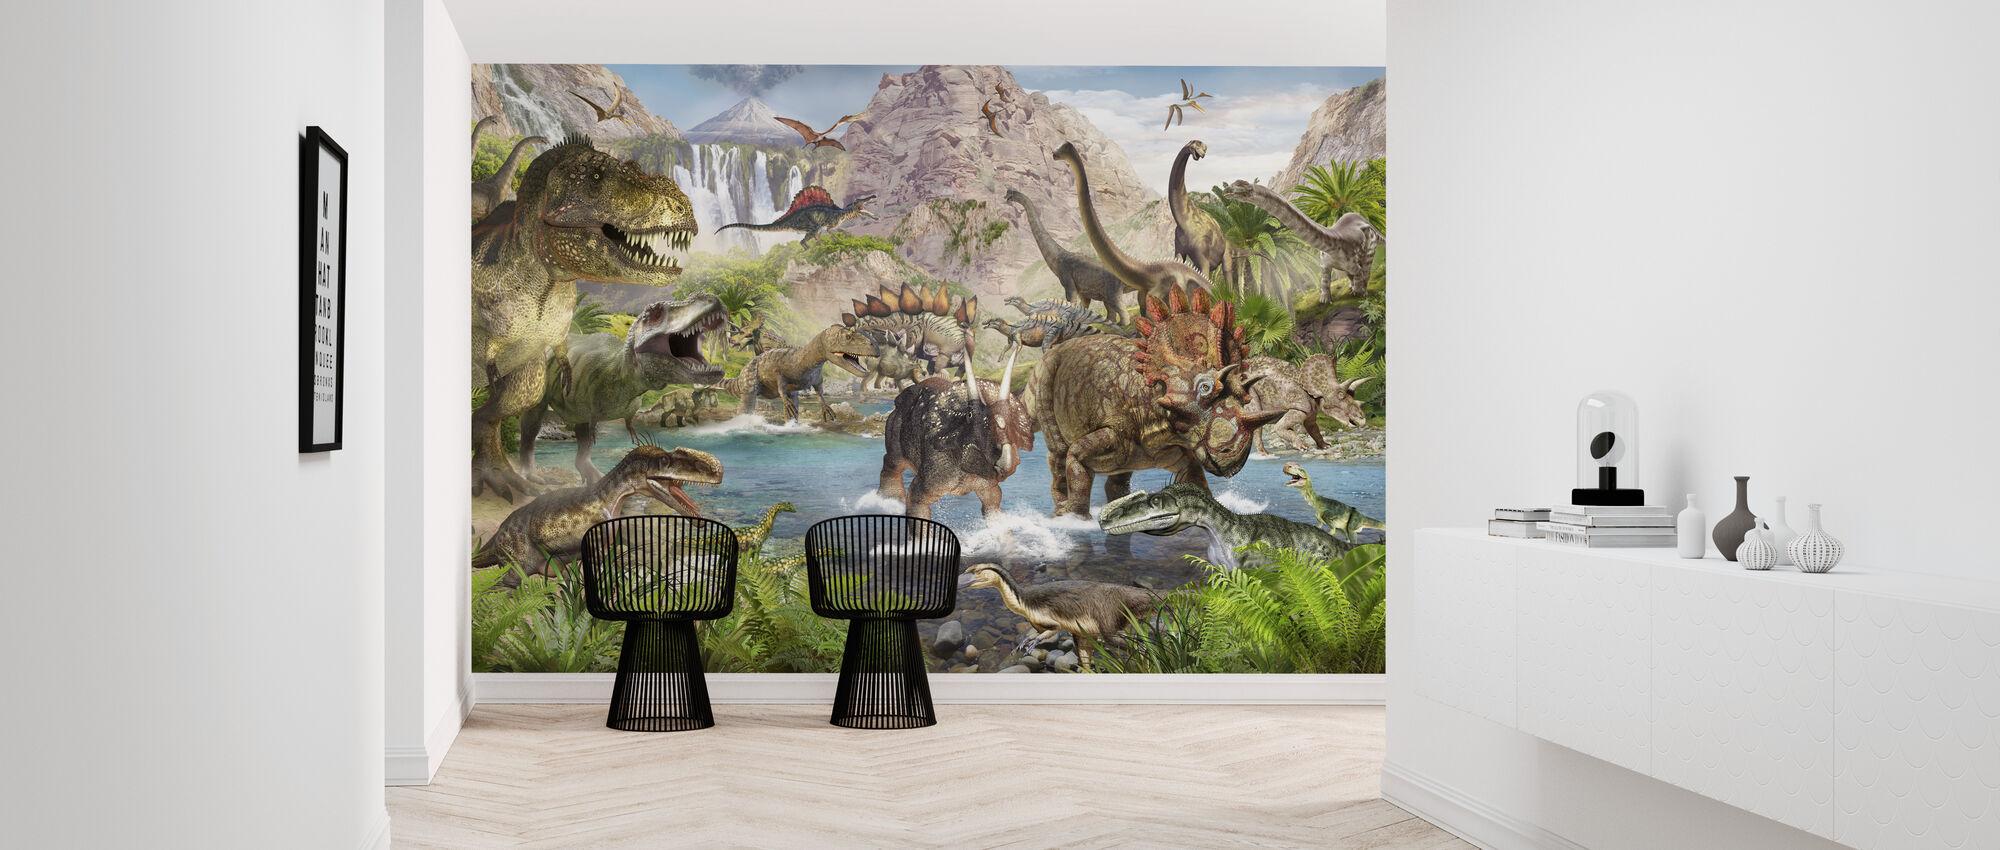 Dinosaur World - Wallpaper - Hallway